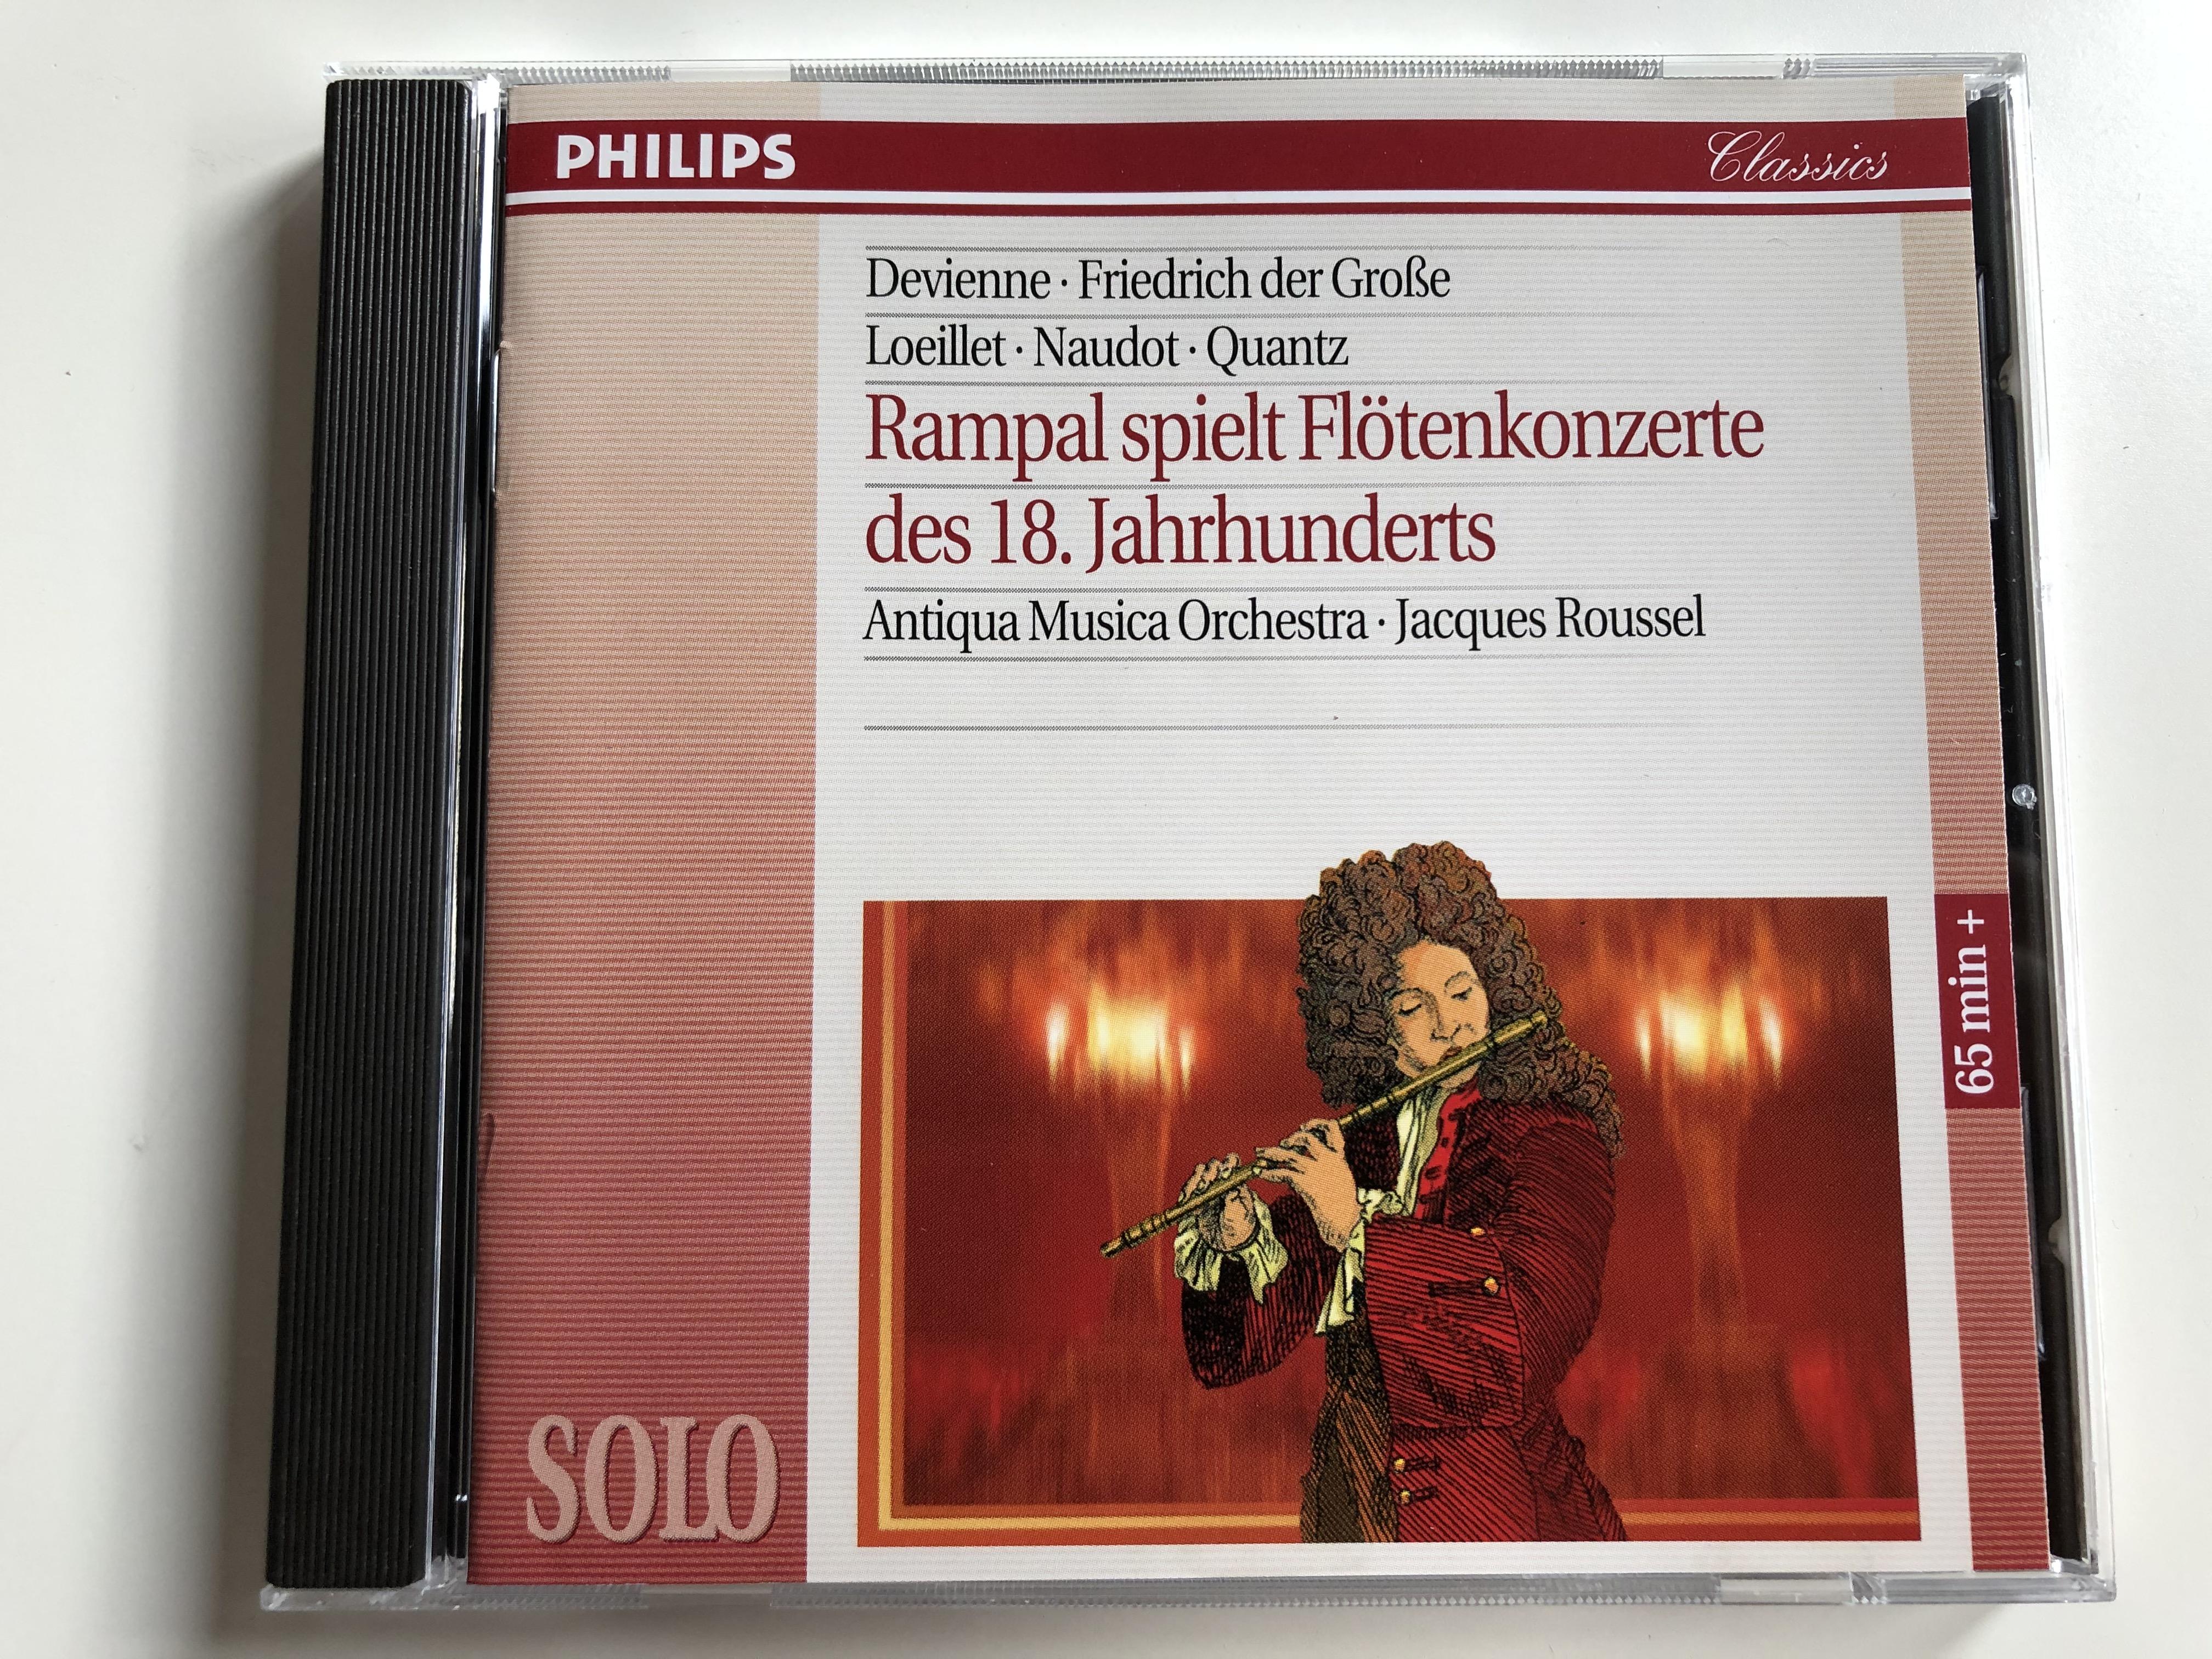 devienne-friedrich-der-grose-loeillet-naudot-quantz-rampal-spielt-flotenkonzerte-des-18.-jahrhunderts-antiqua-musica-orchestra-jacques-roussel-solo-65-min-philips-audio-cd-1994-442-662-1-.jpg